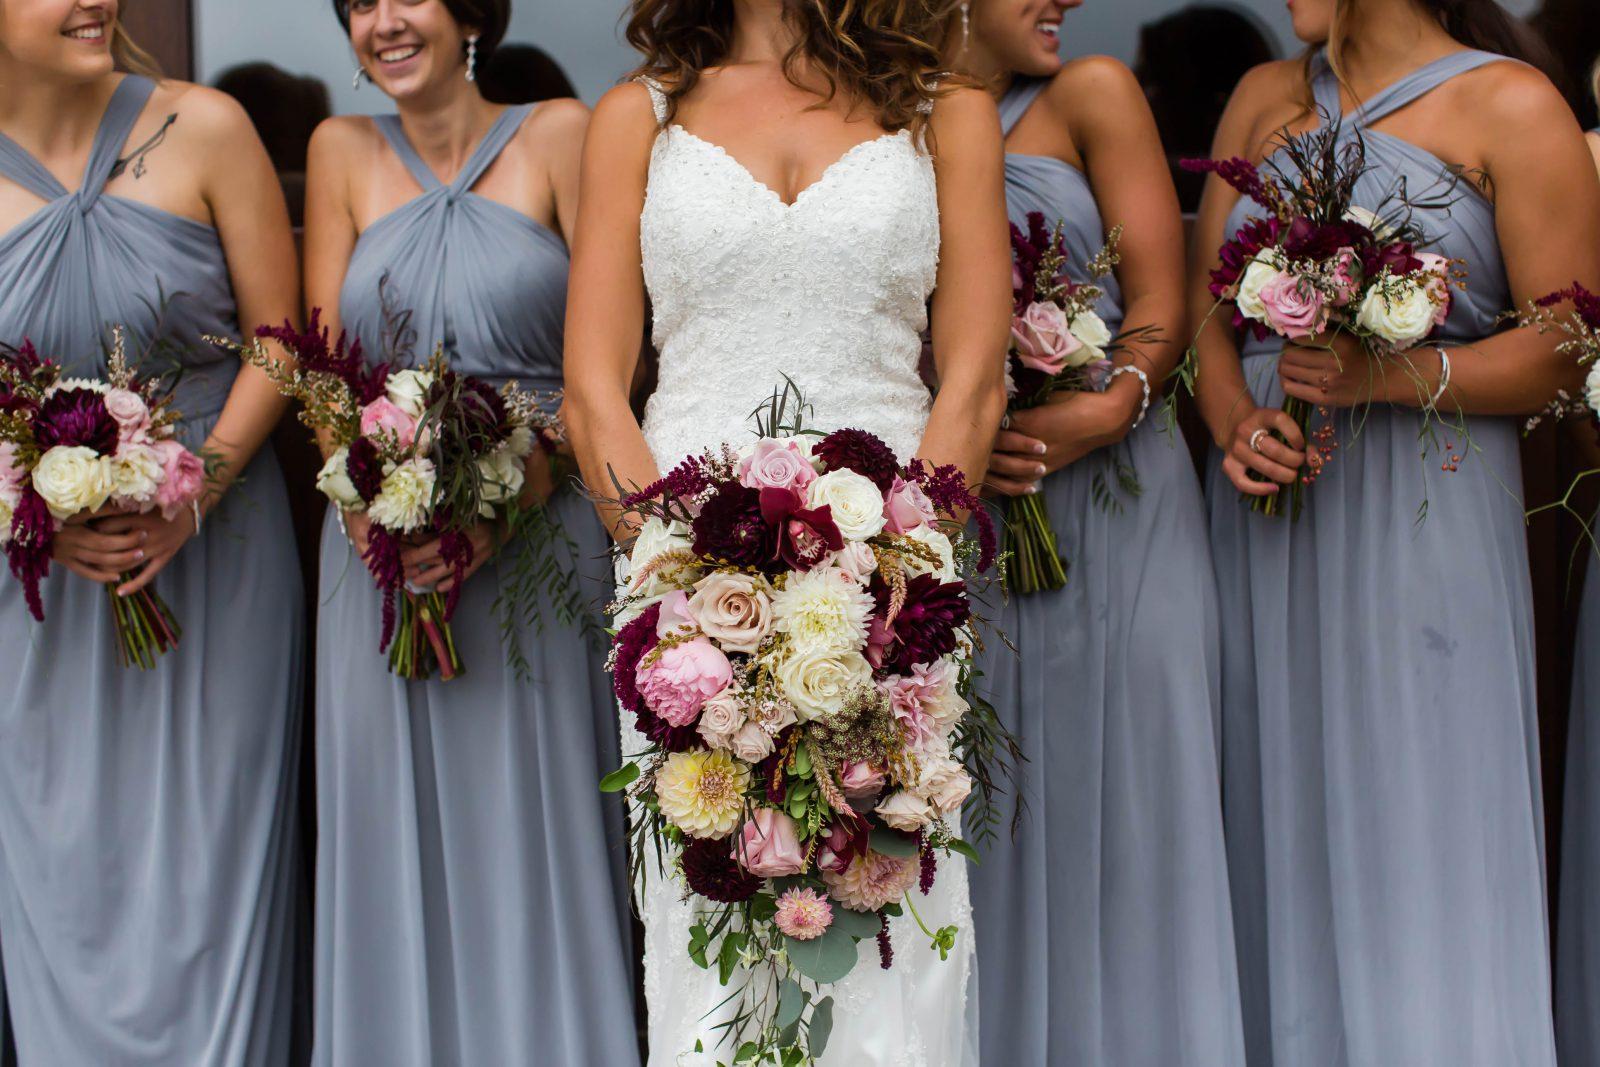 sunny-hill-wedding-venue-loren-jackson-photography-46